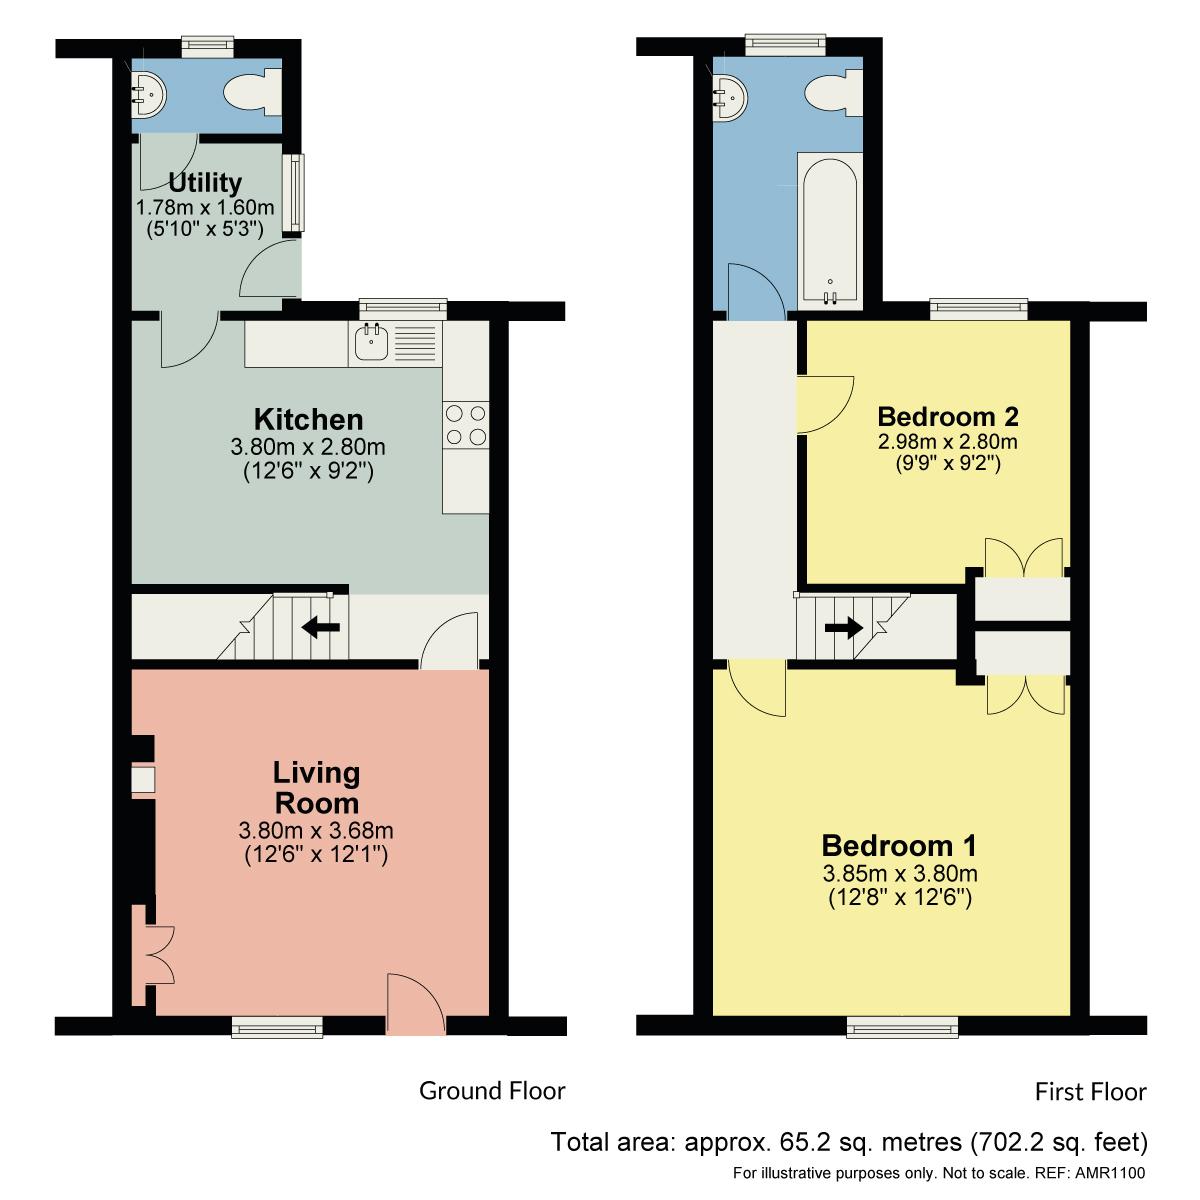 Floorplan Damson Cottage, 31 Bank Terrace, Coniston, Cumbria LA21 8HF